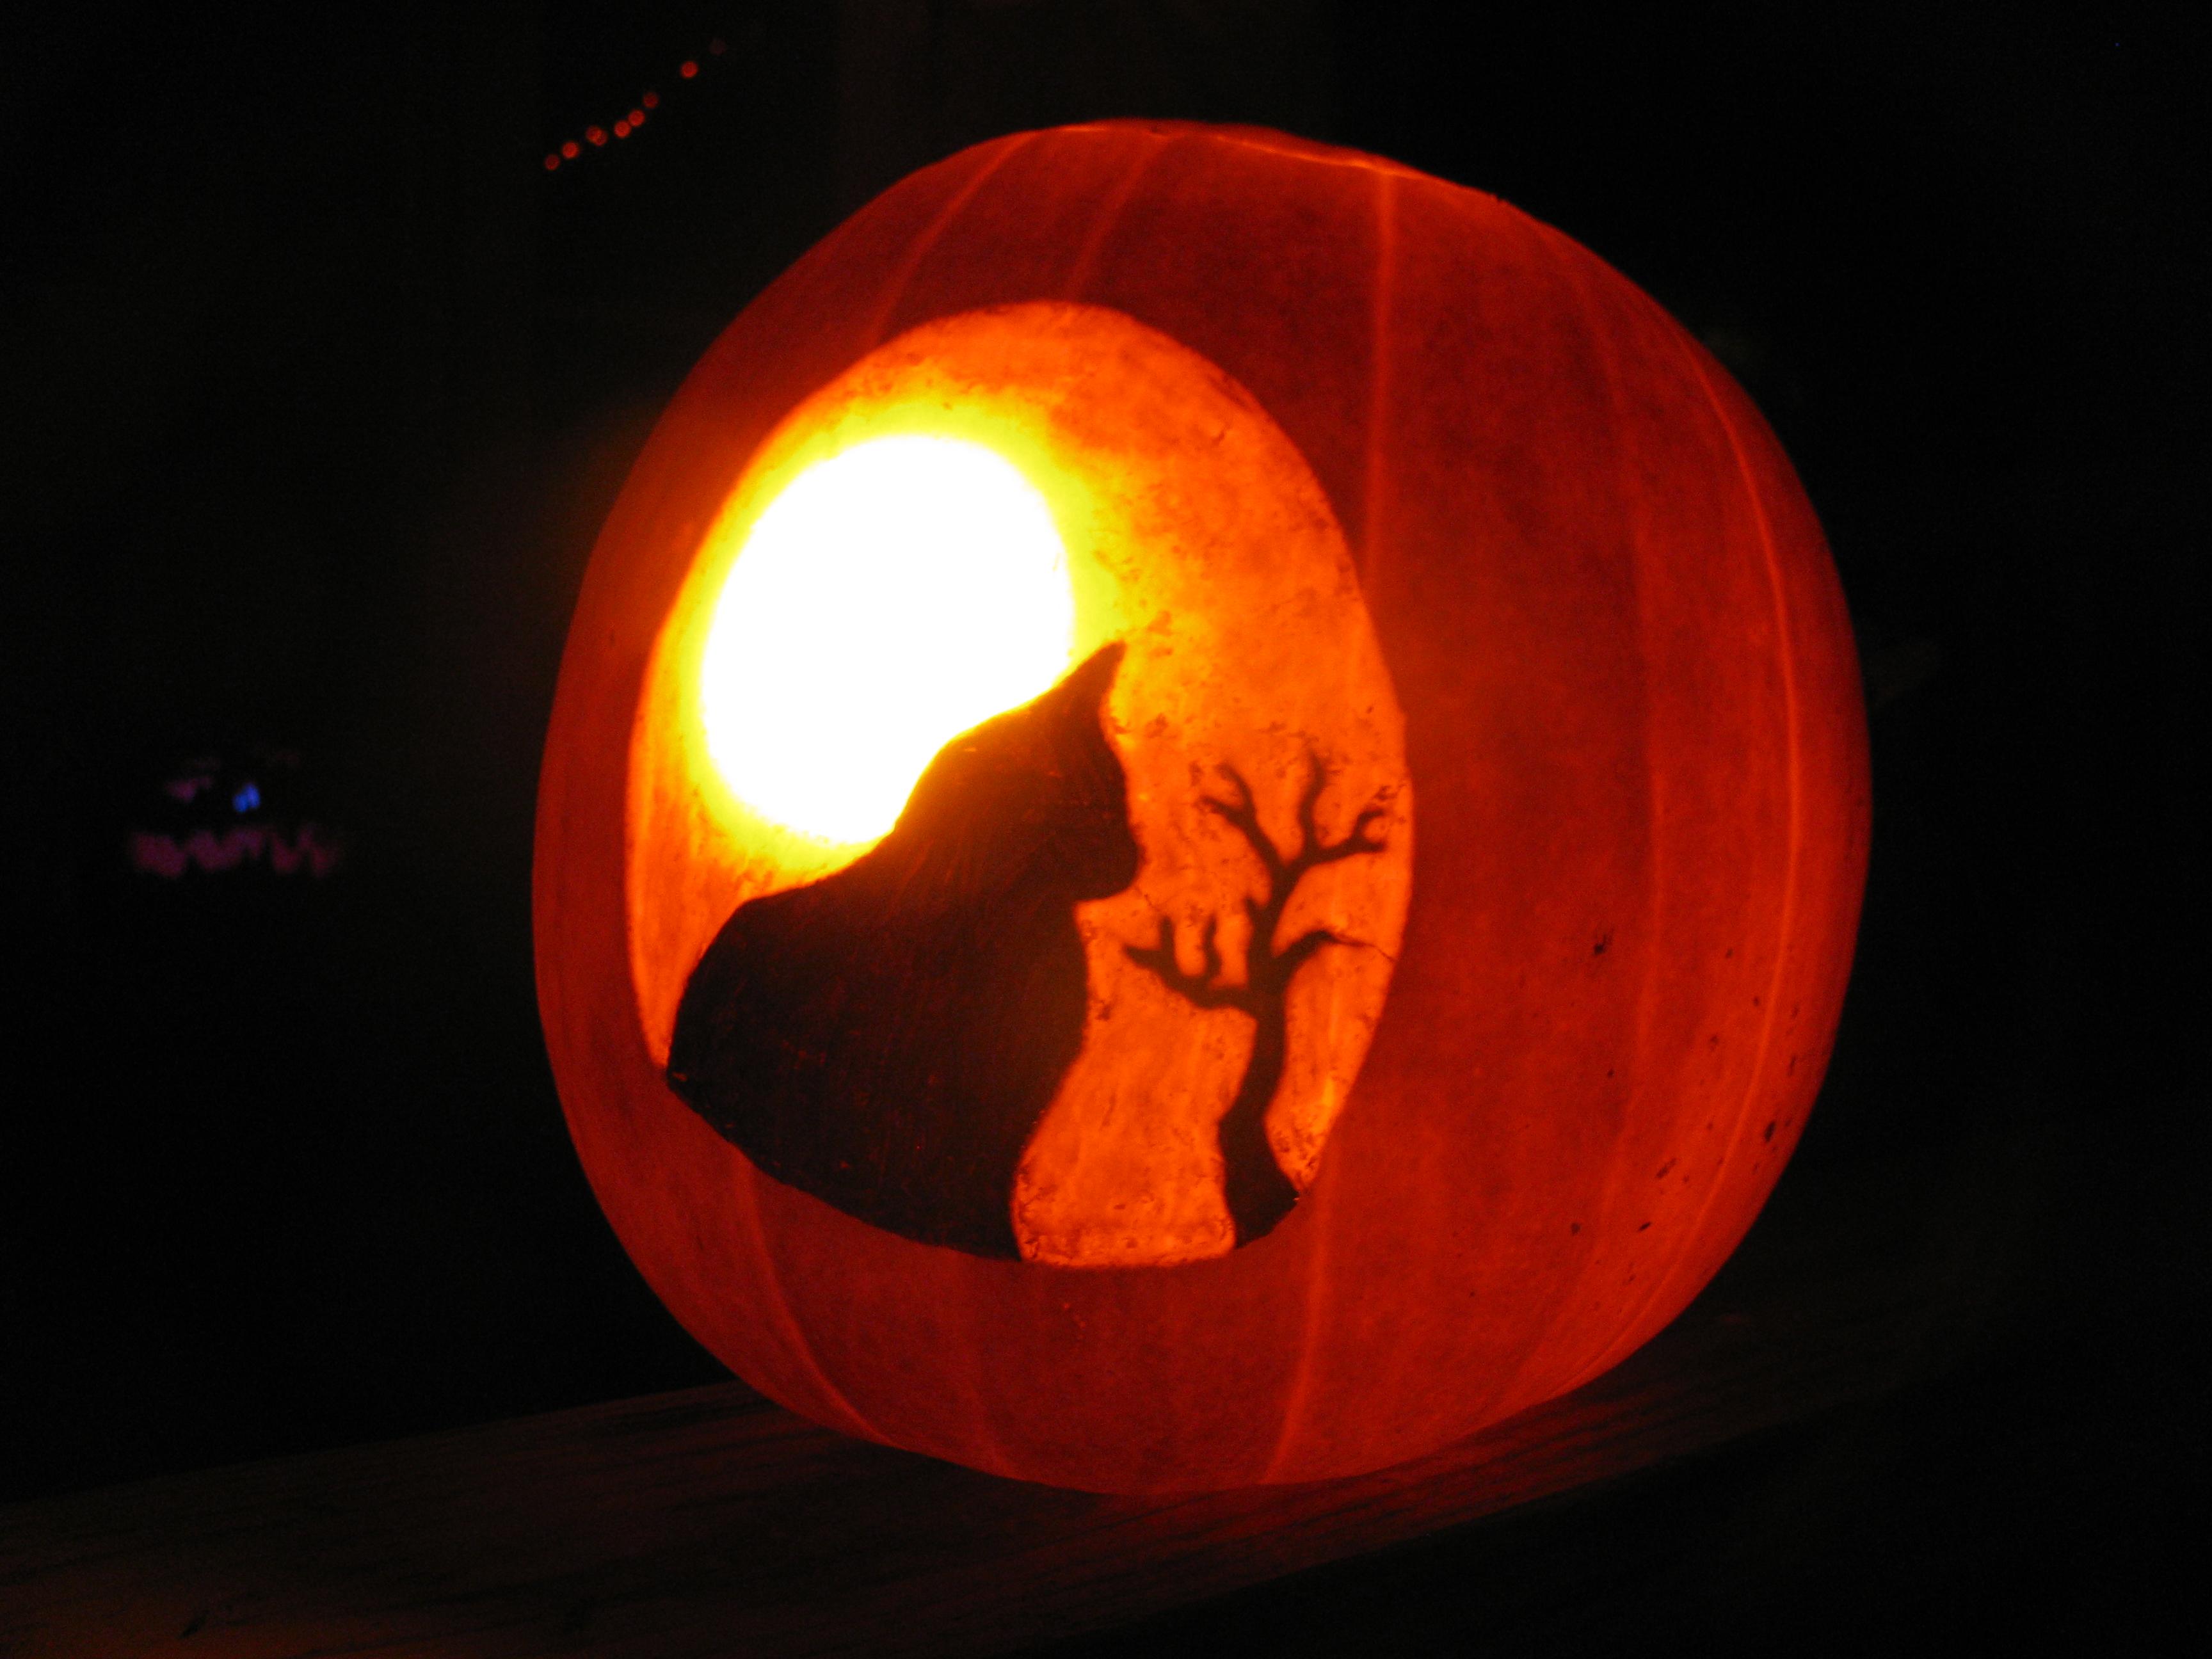 Cat in moonlight by pumpkin crazy on deviantart